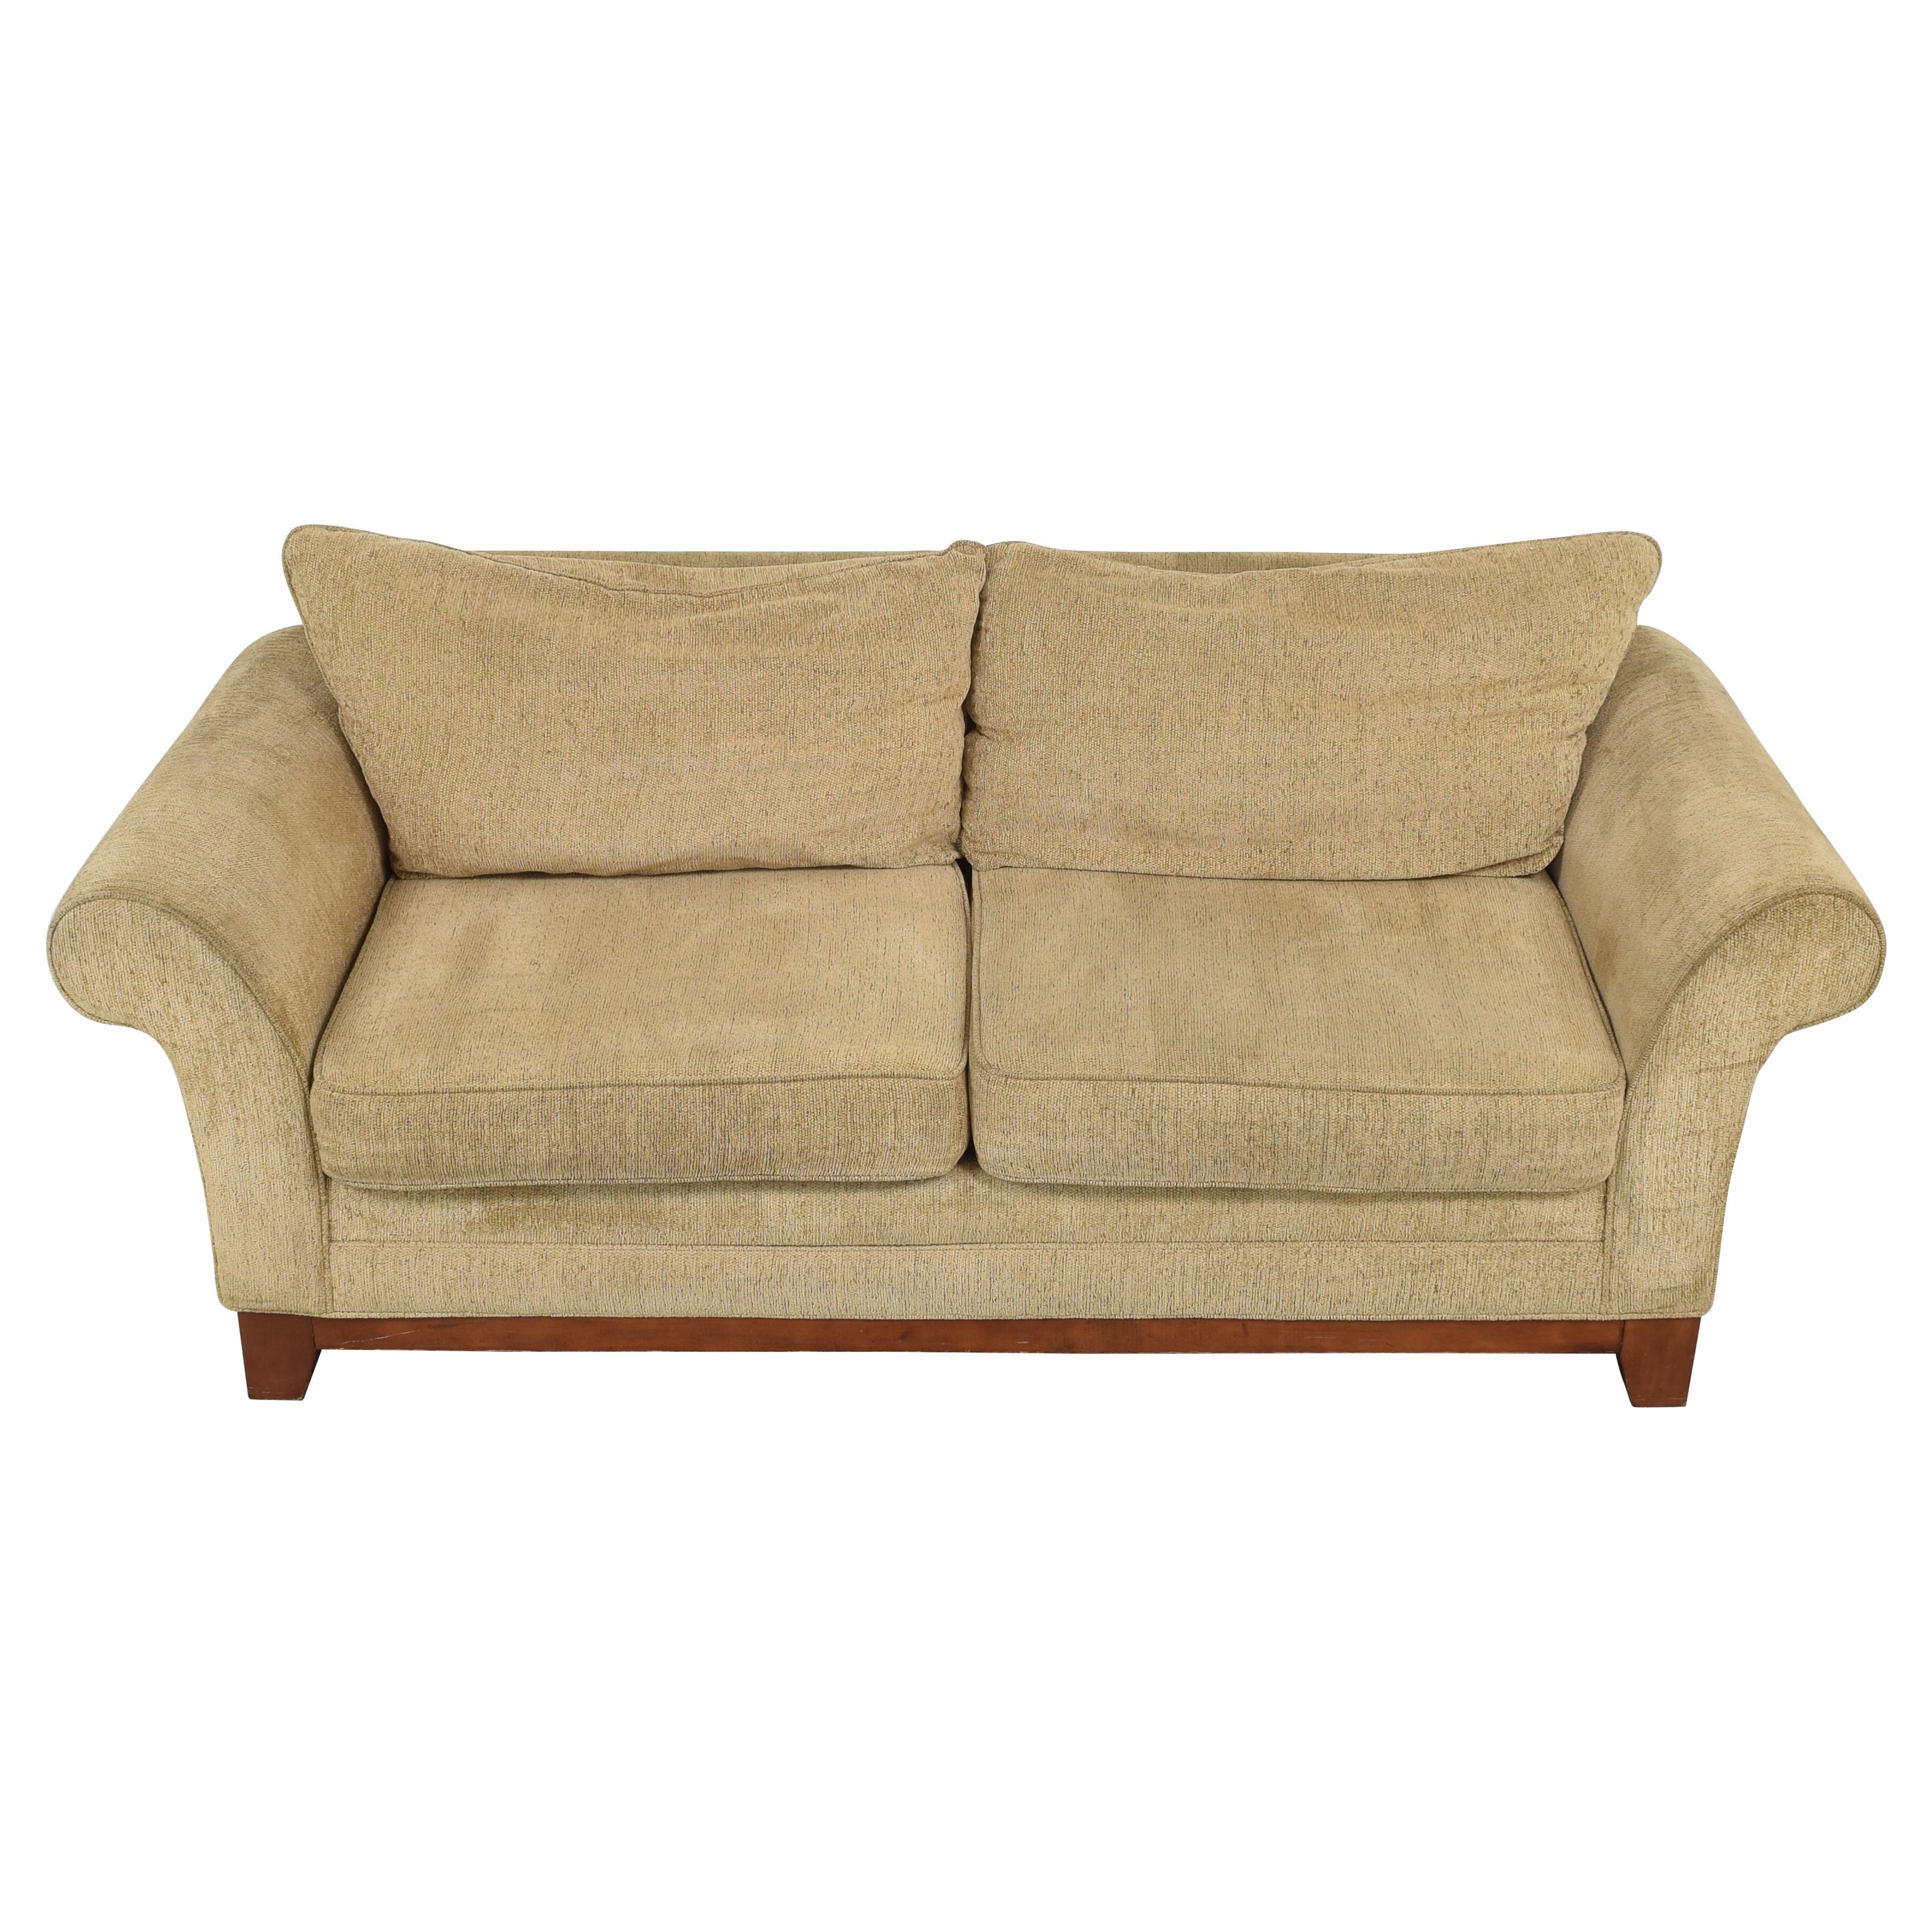 Rolled Arm Two Cushion Sofa